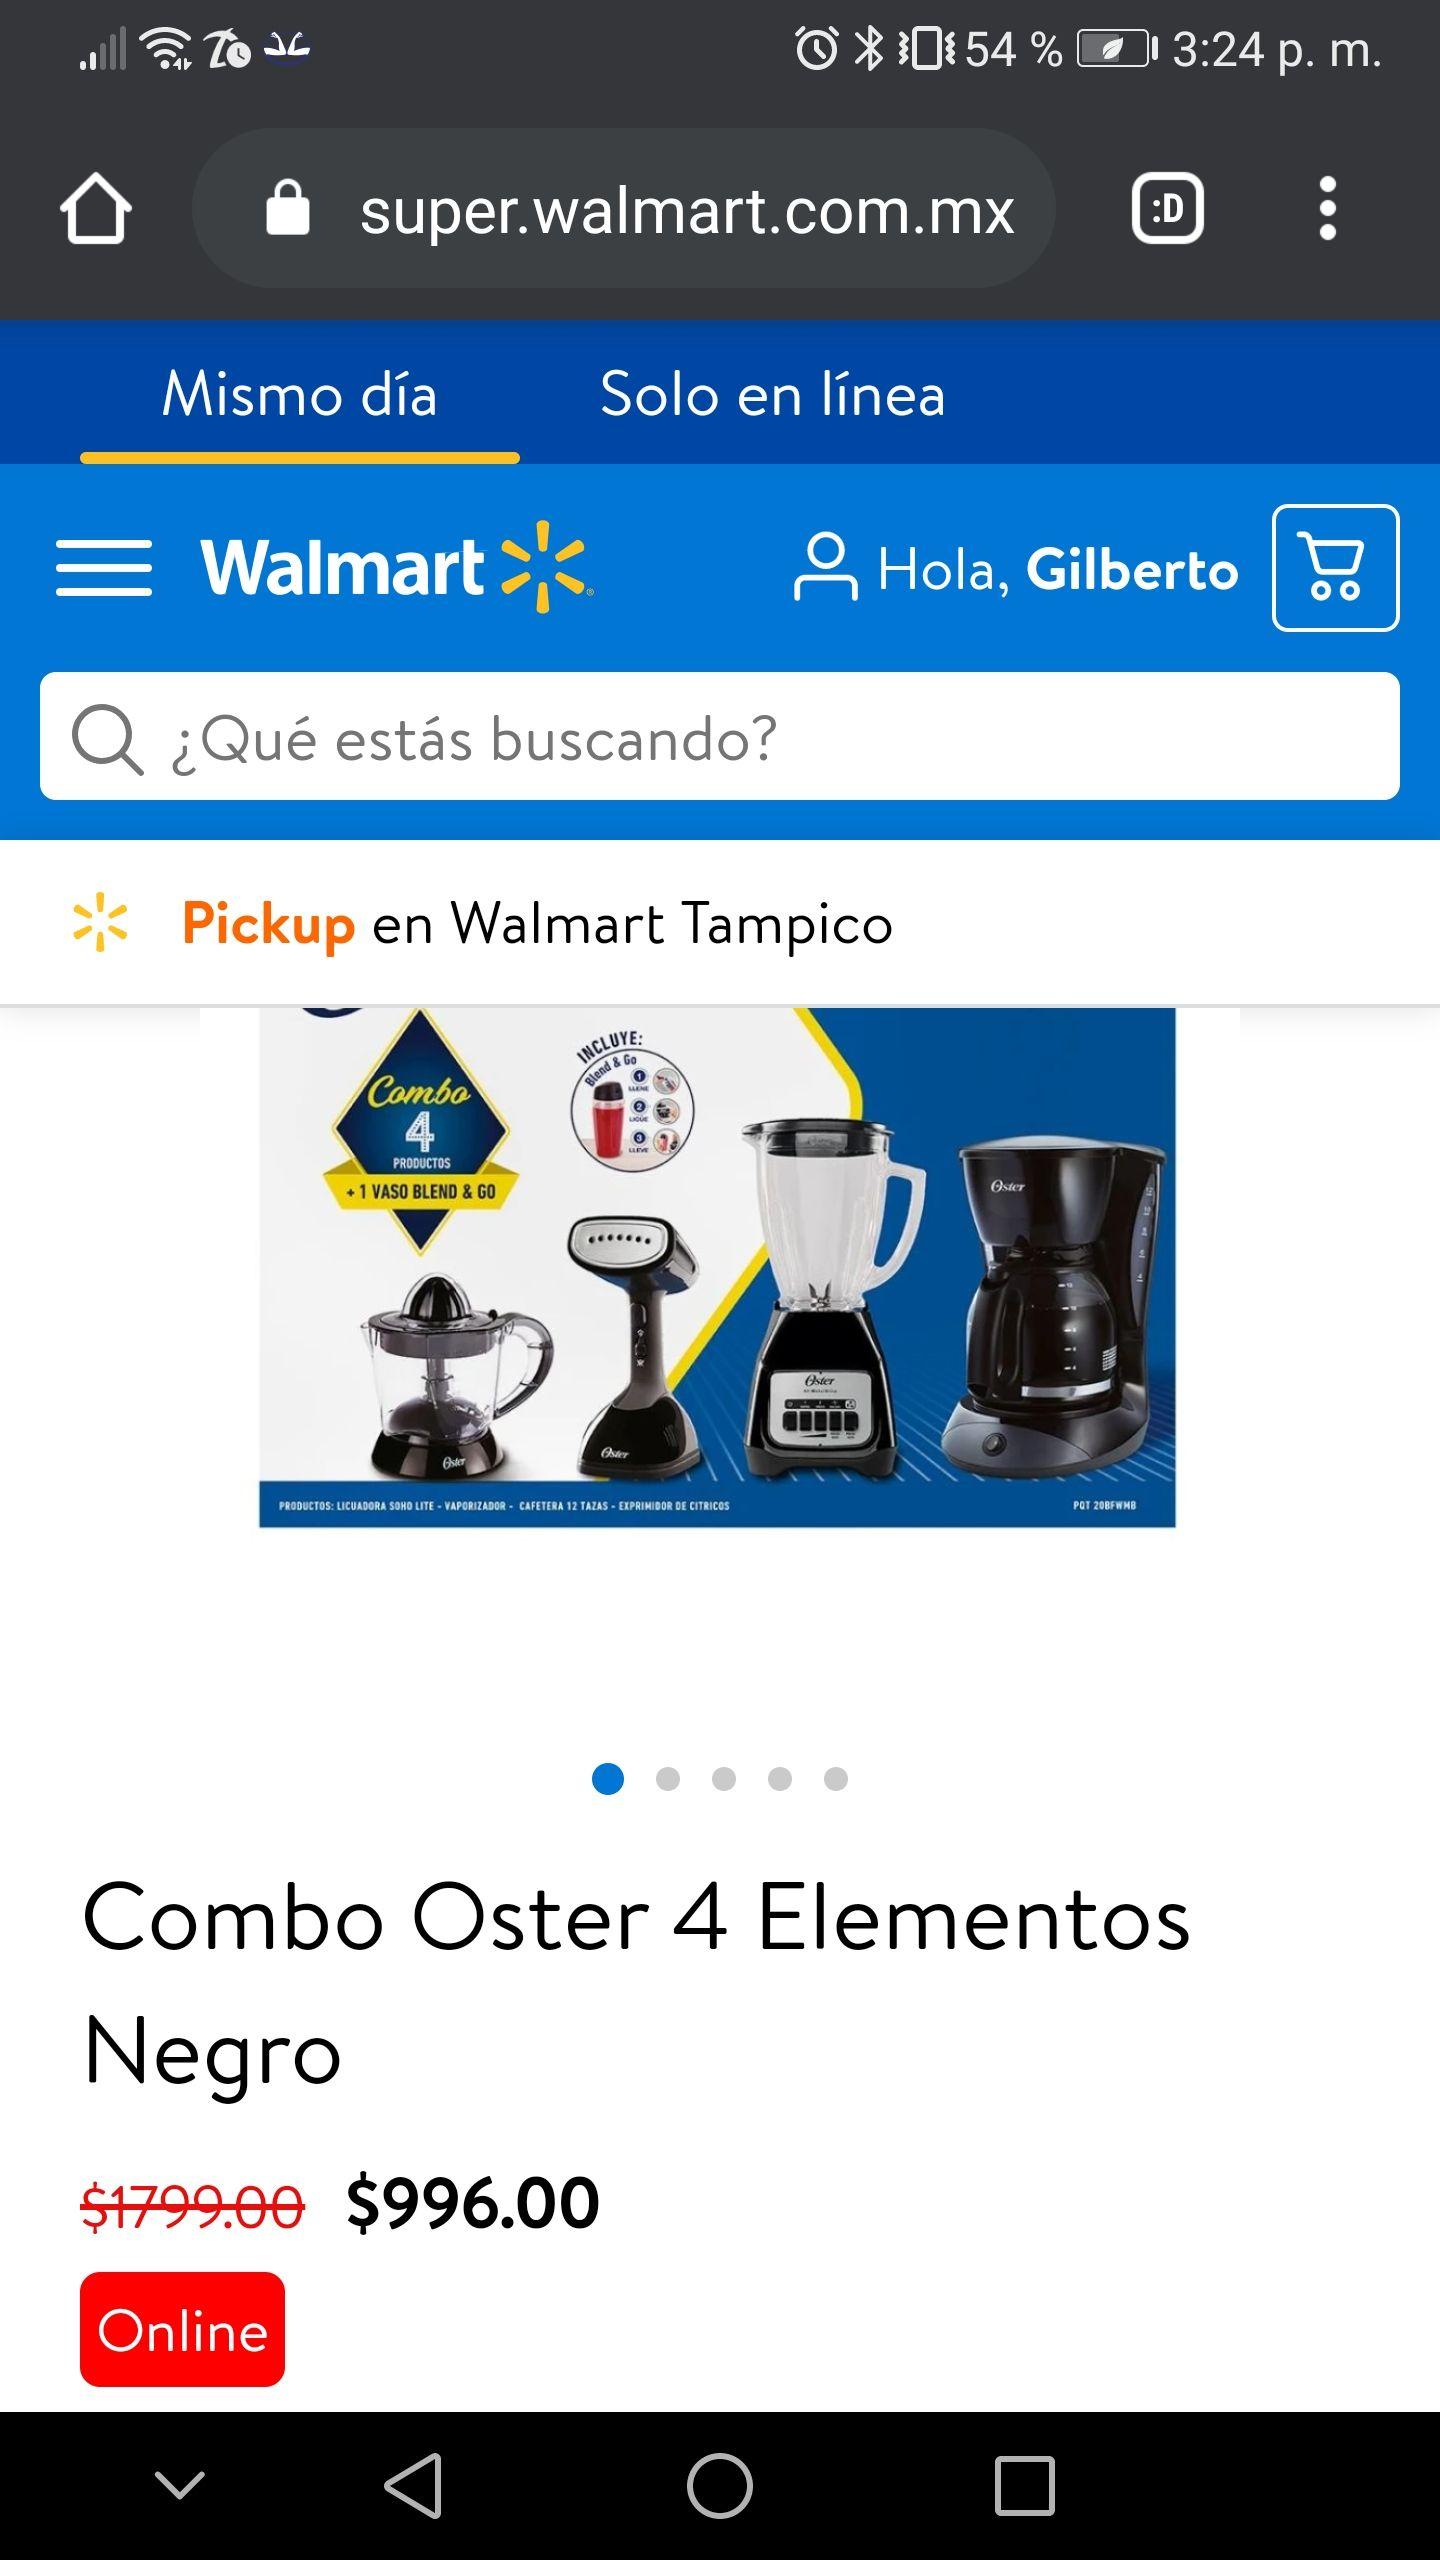 Walmart en línea combo Oster Delux 4 piezas de $1,799 a $996